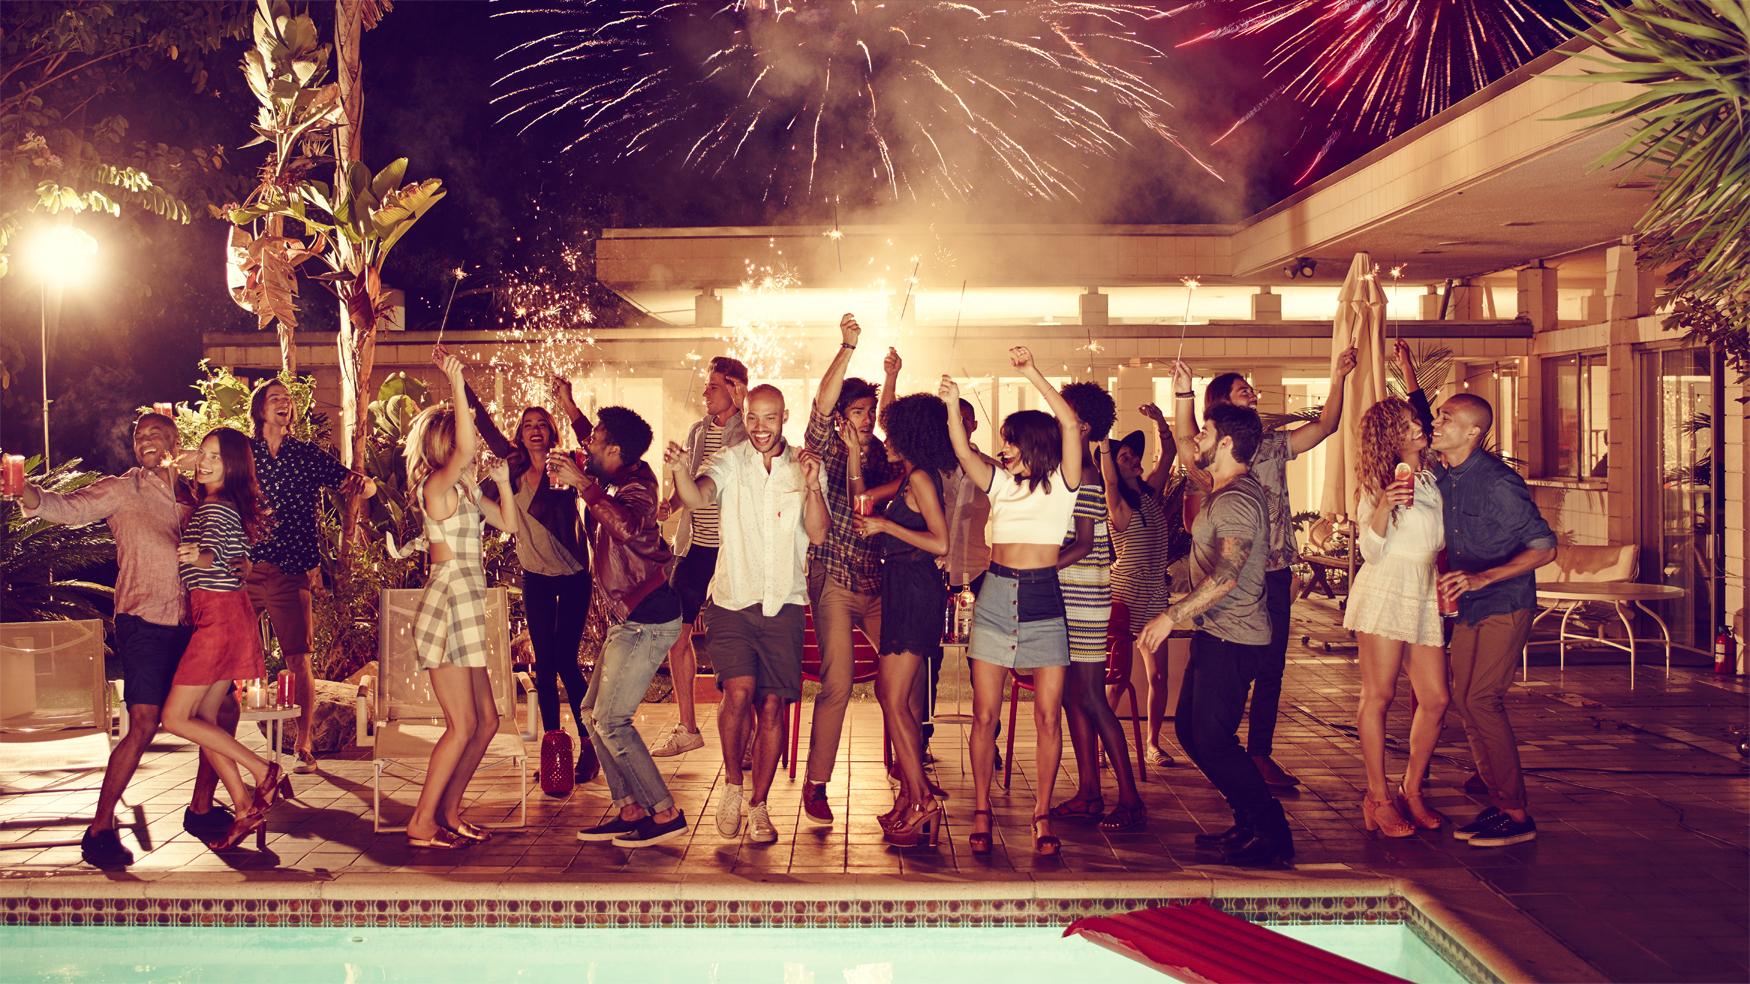 pool fireworks 0201 16x9